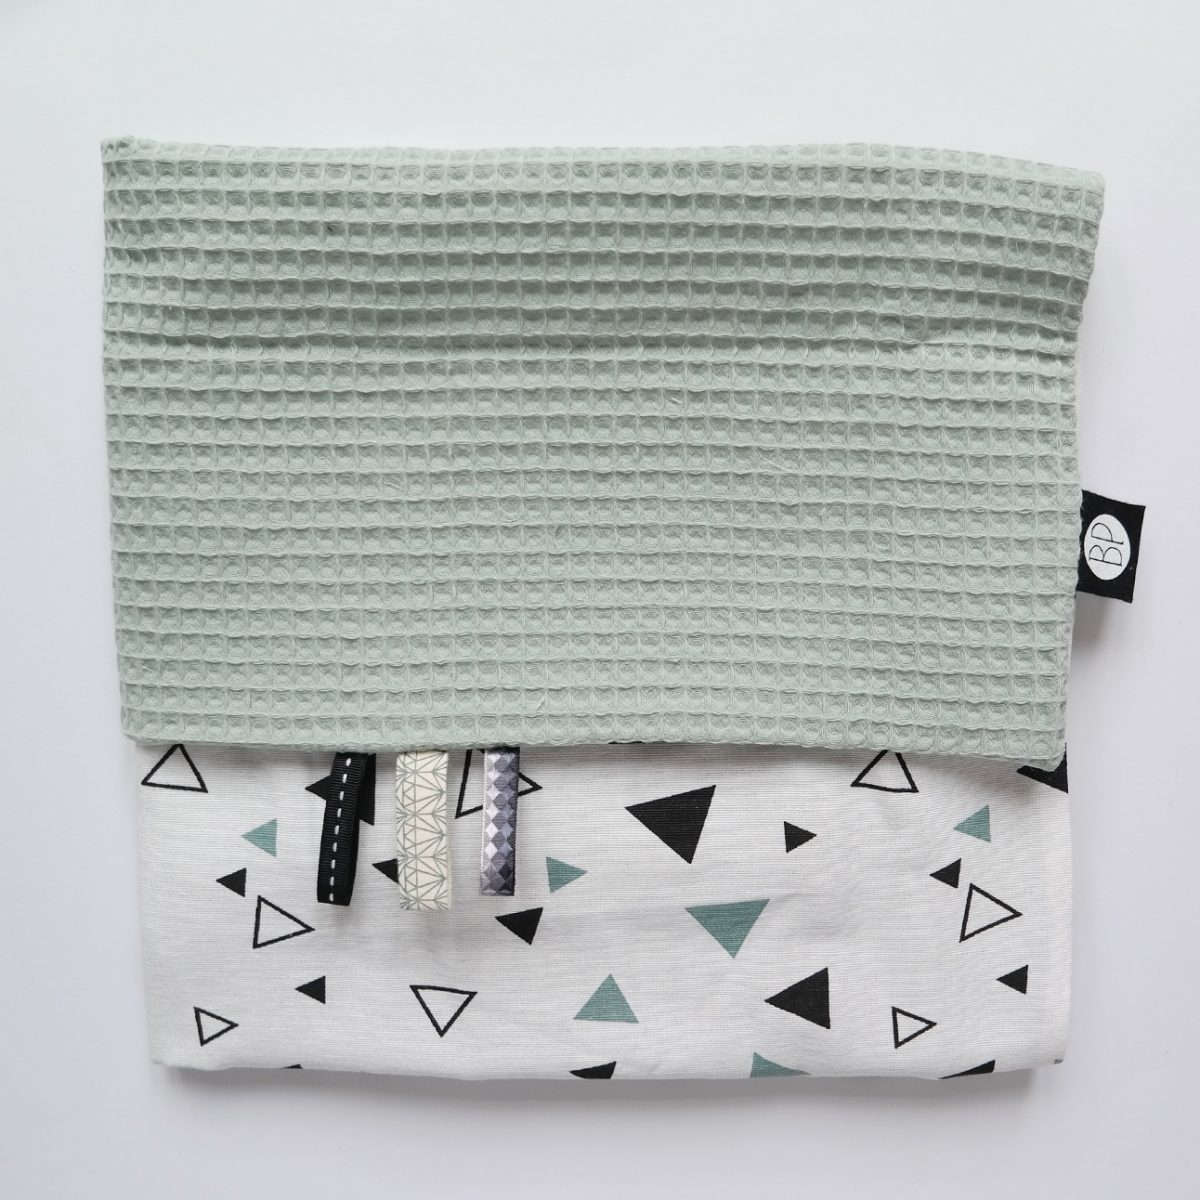 Ledikantdeken wafel oud groen met zwart wit groen driehoek print